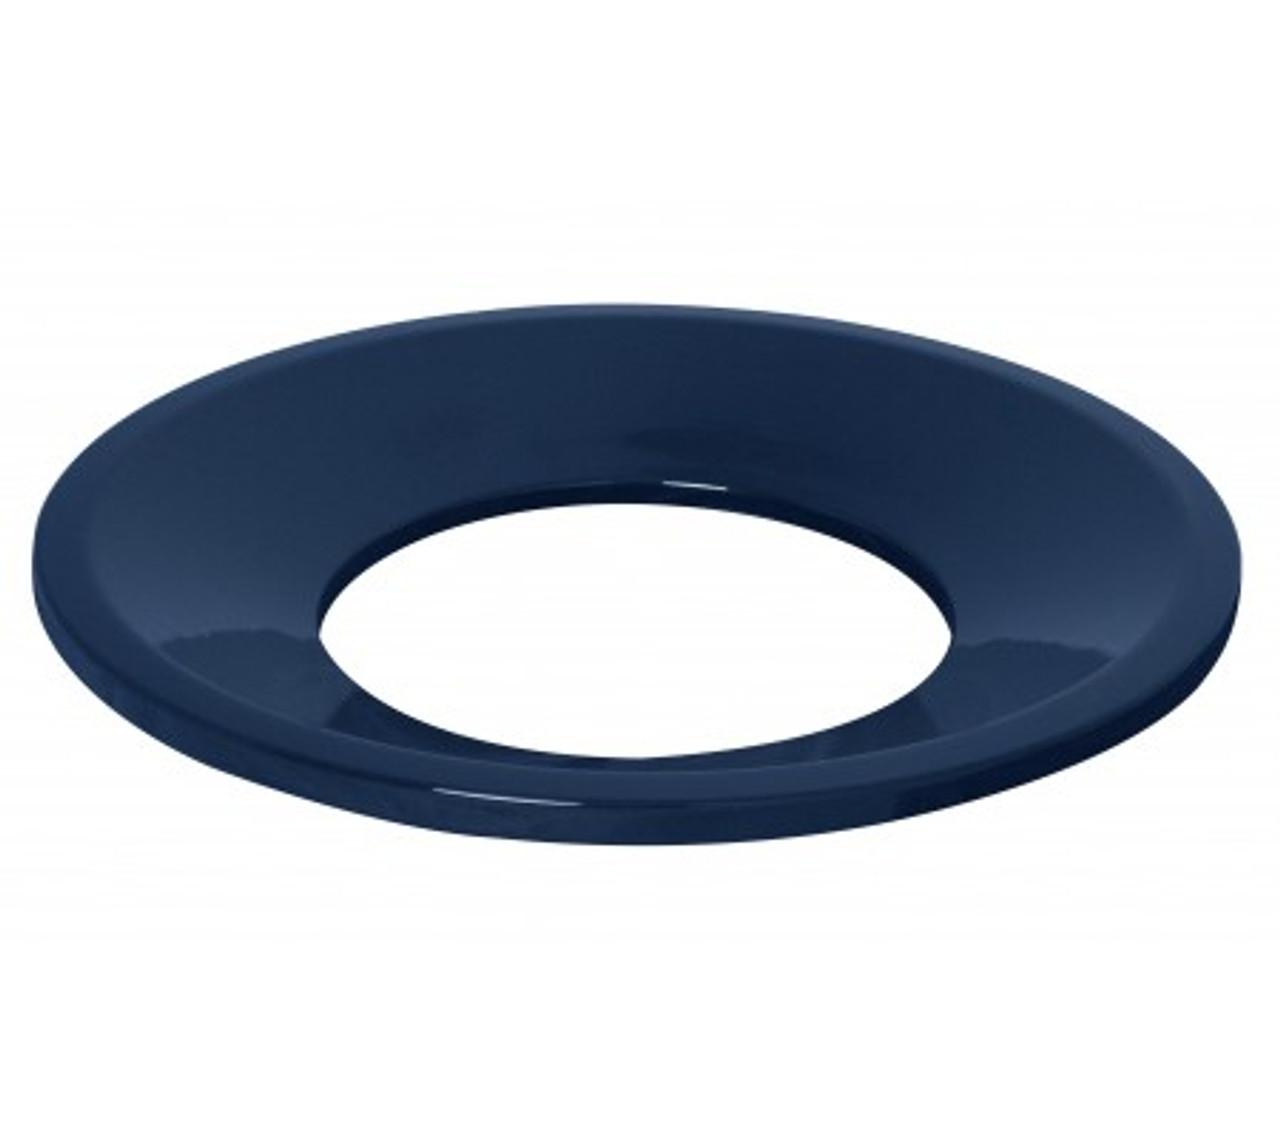 Funnel Lid Textured Indigo Blue Trash Can Lid